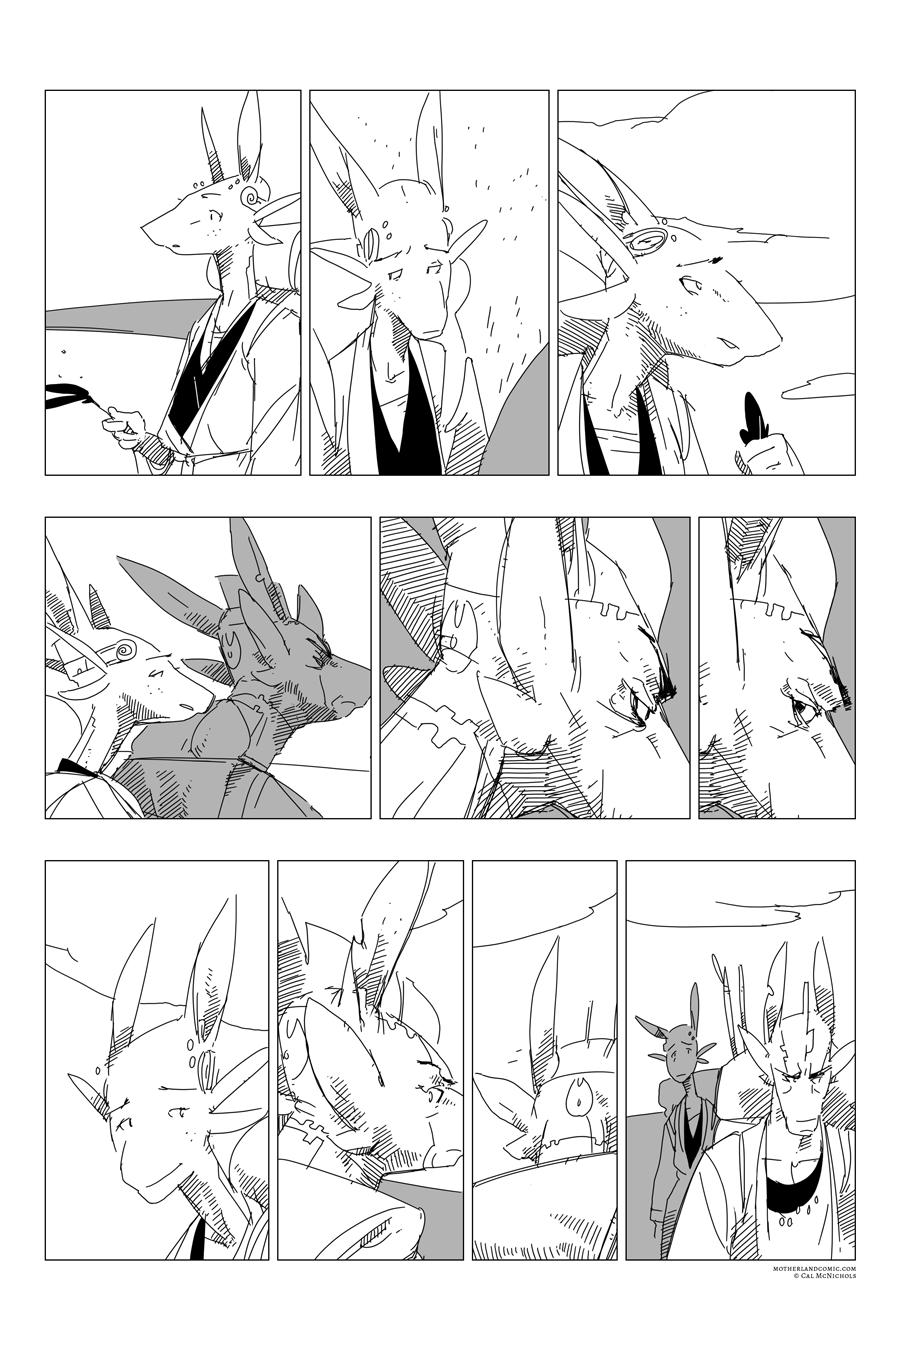 pg 67